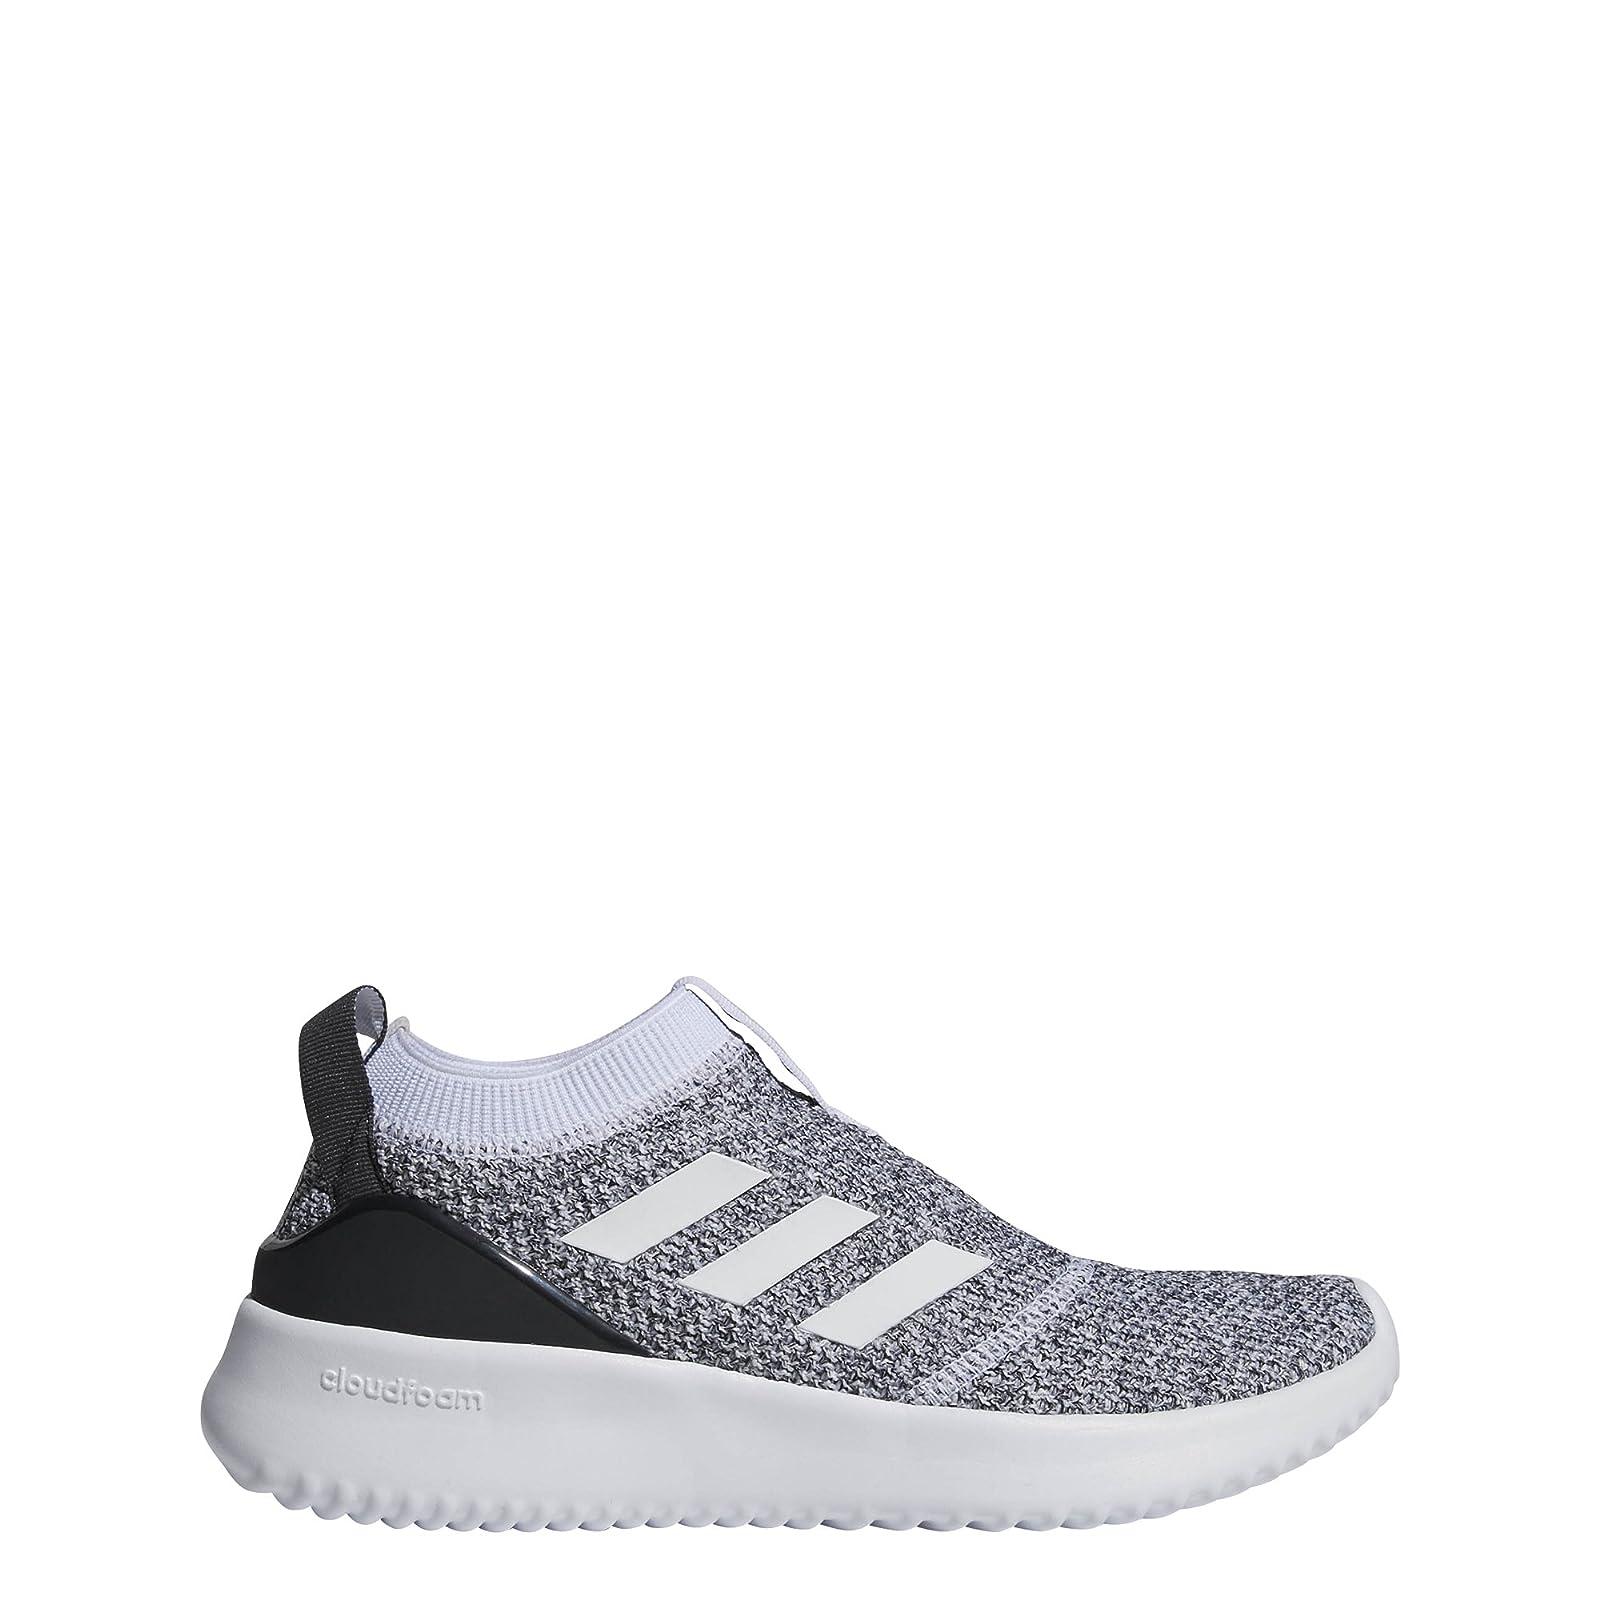 Ultimafusion Running Shoe B96469